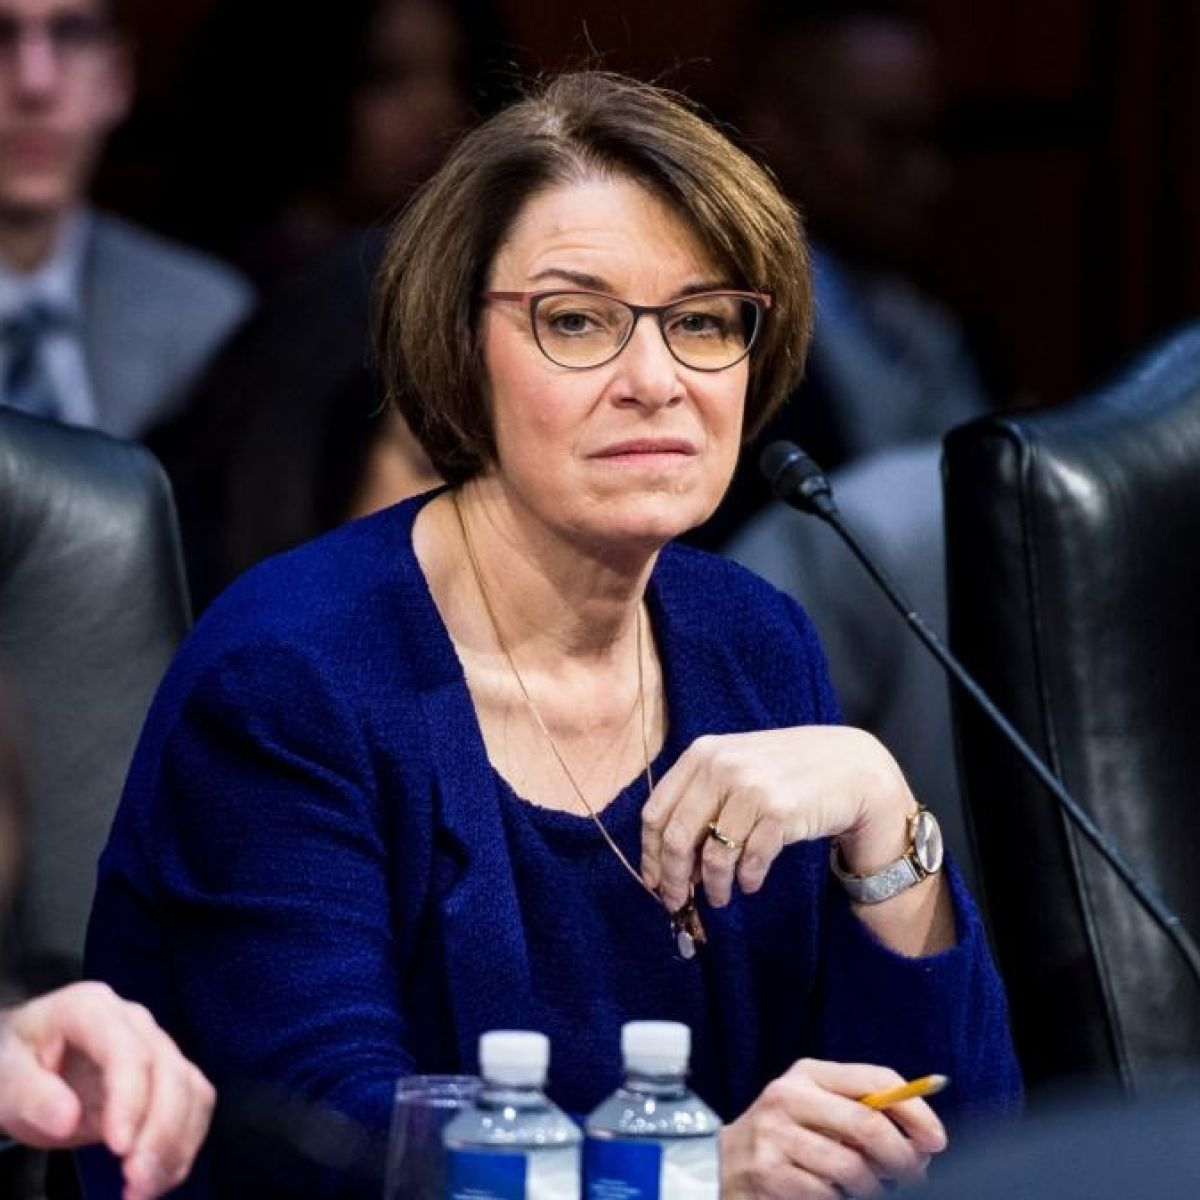 US senator Amy Klobuchar set to join widening presidential field